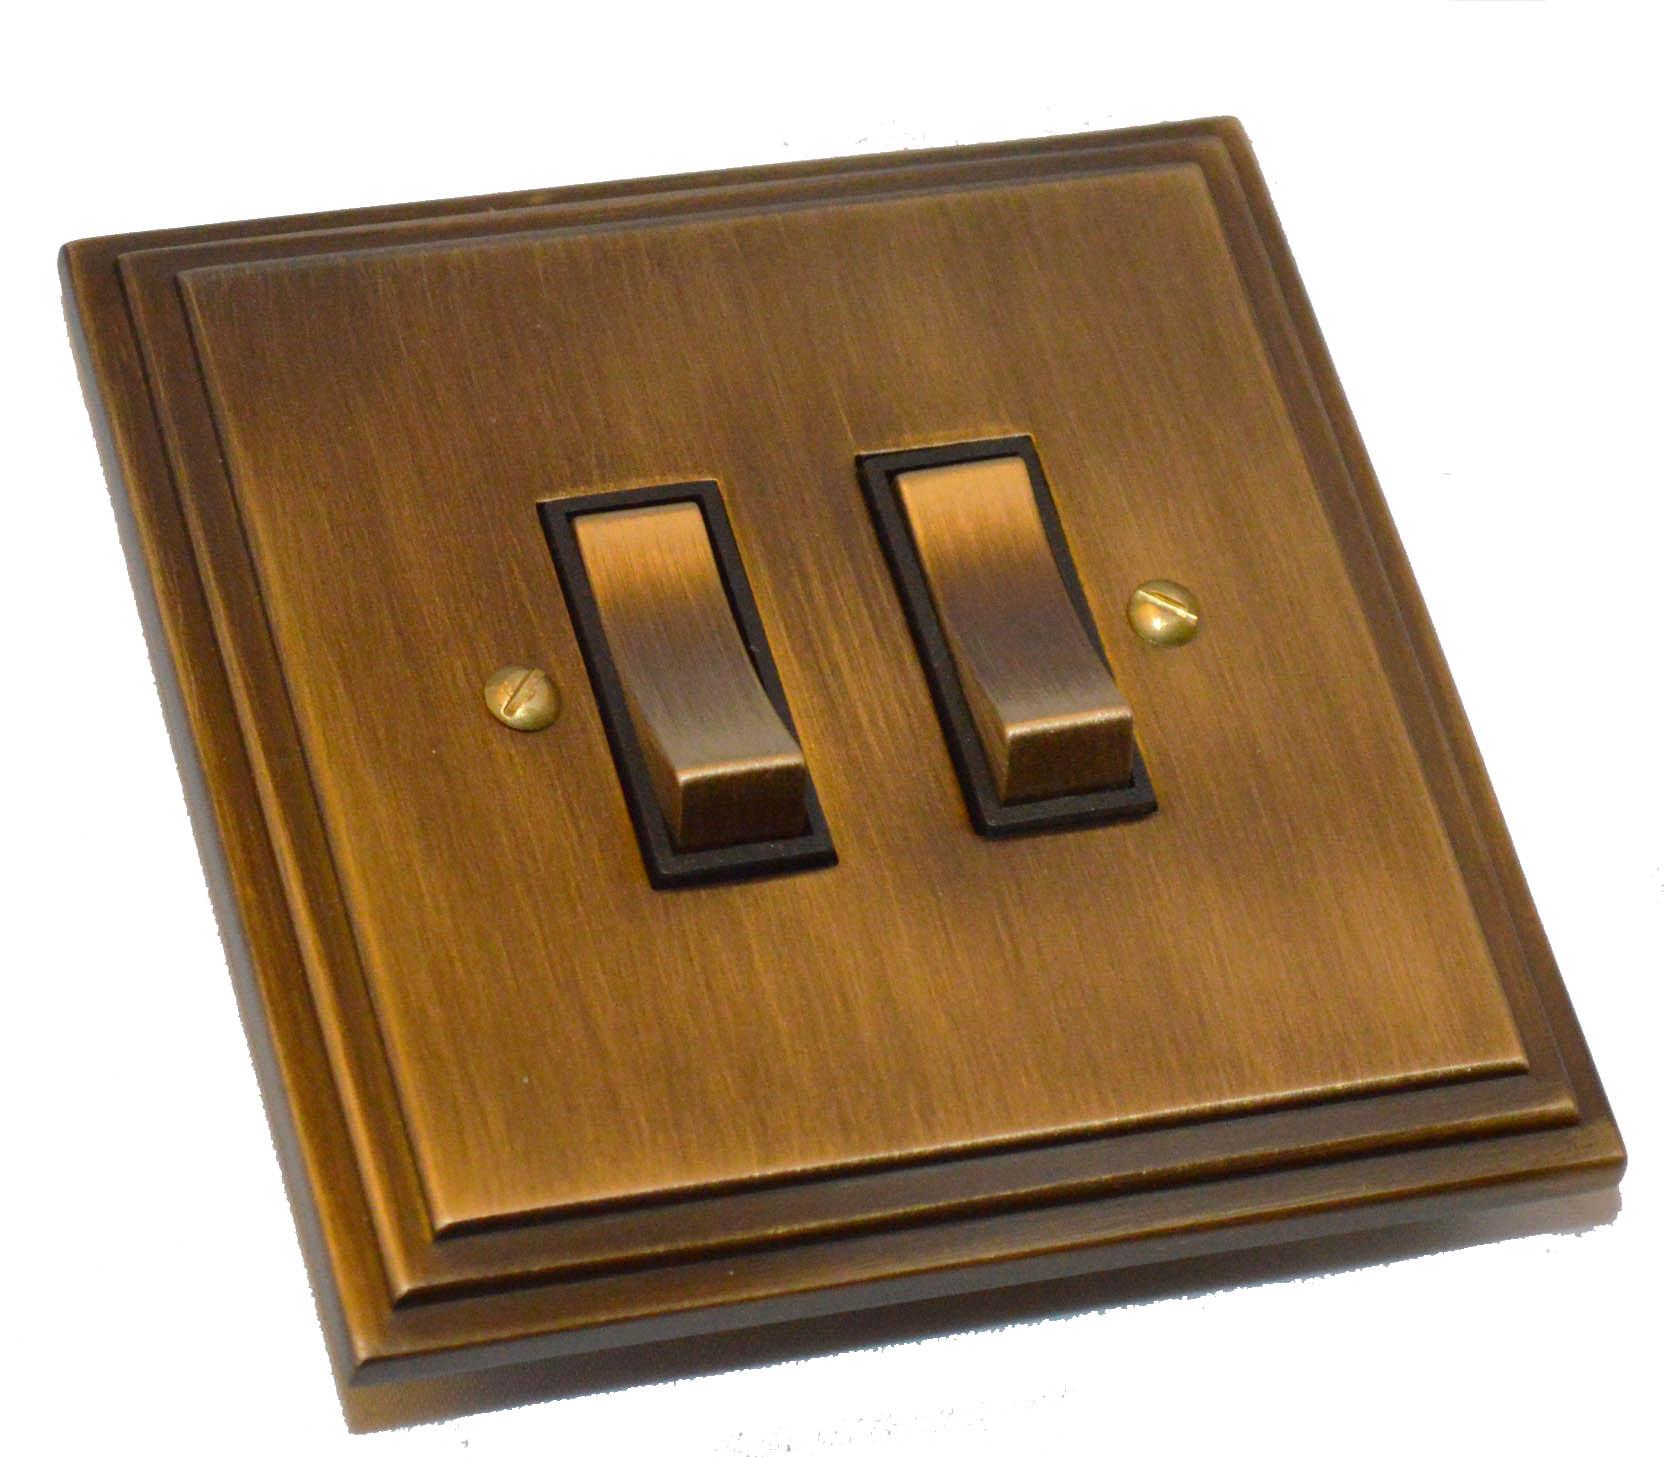 Antique Brass Edwardian 2 Gang Light Switch 20 Amp 2 Way Pst909ab